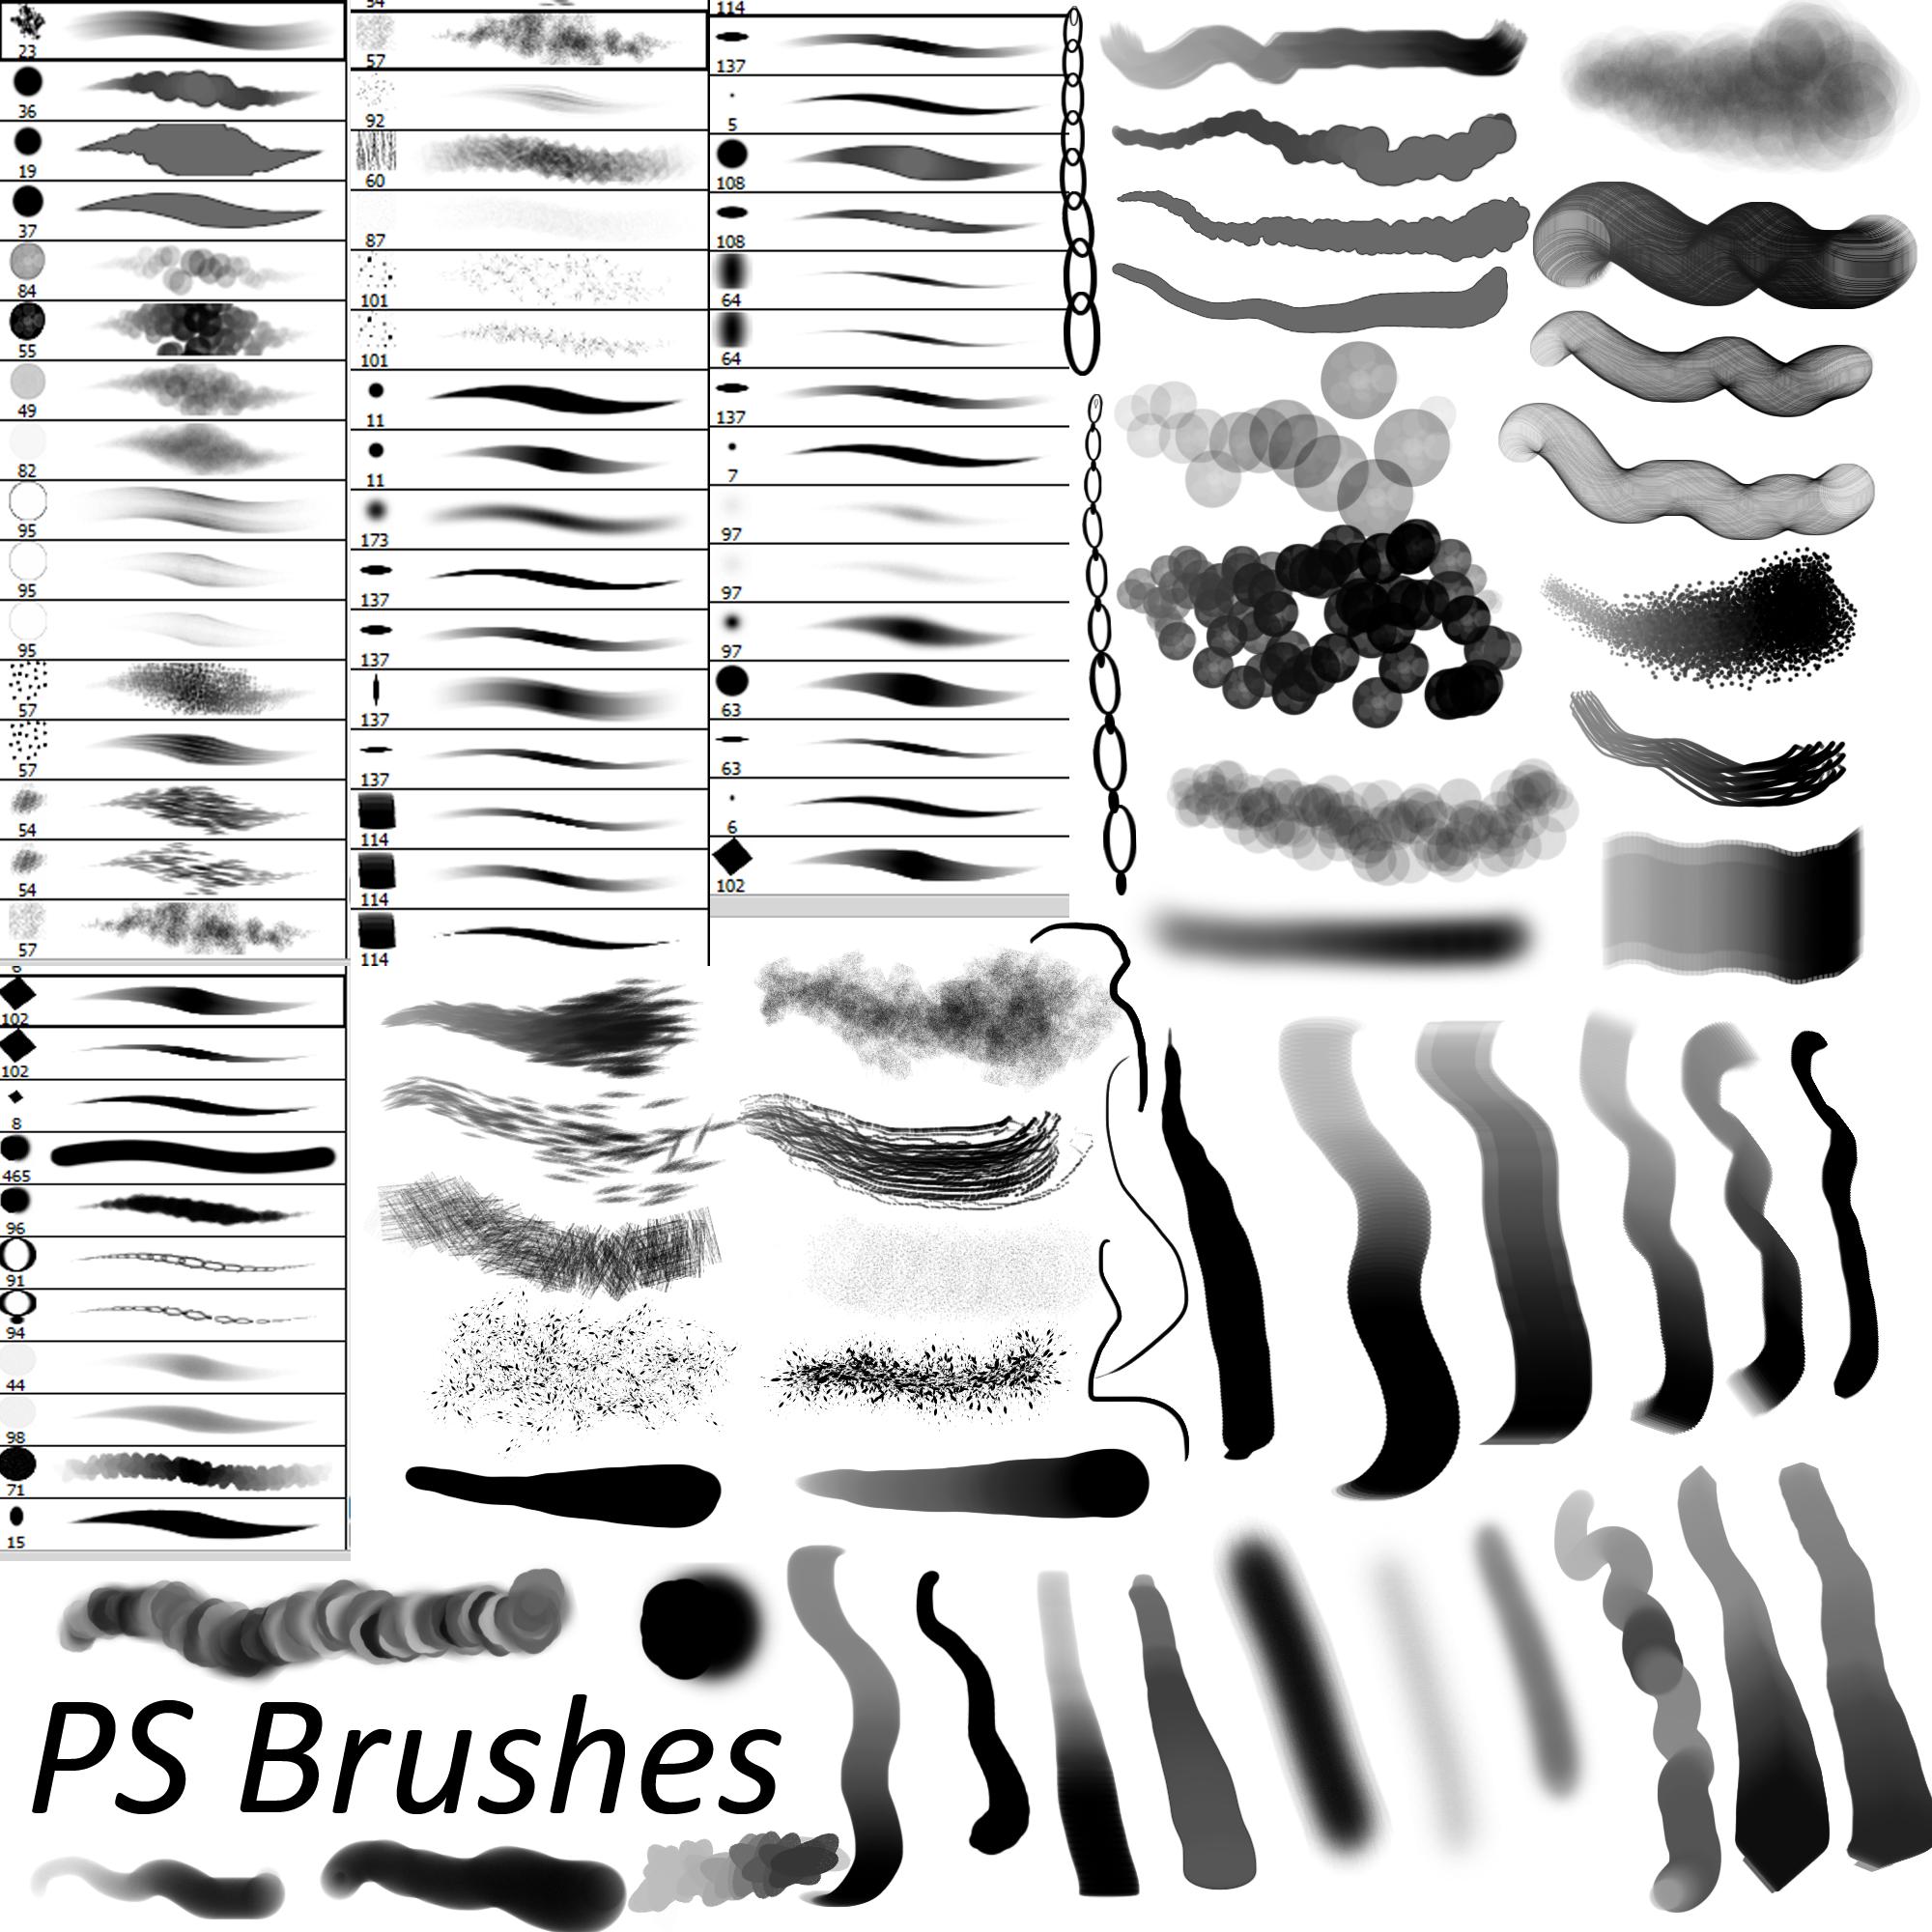 Line Art Brushes Photo : Ps brushes by dark zeblock on deviantart